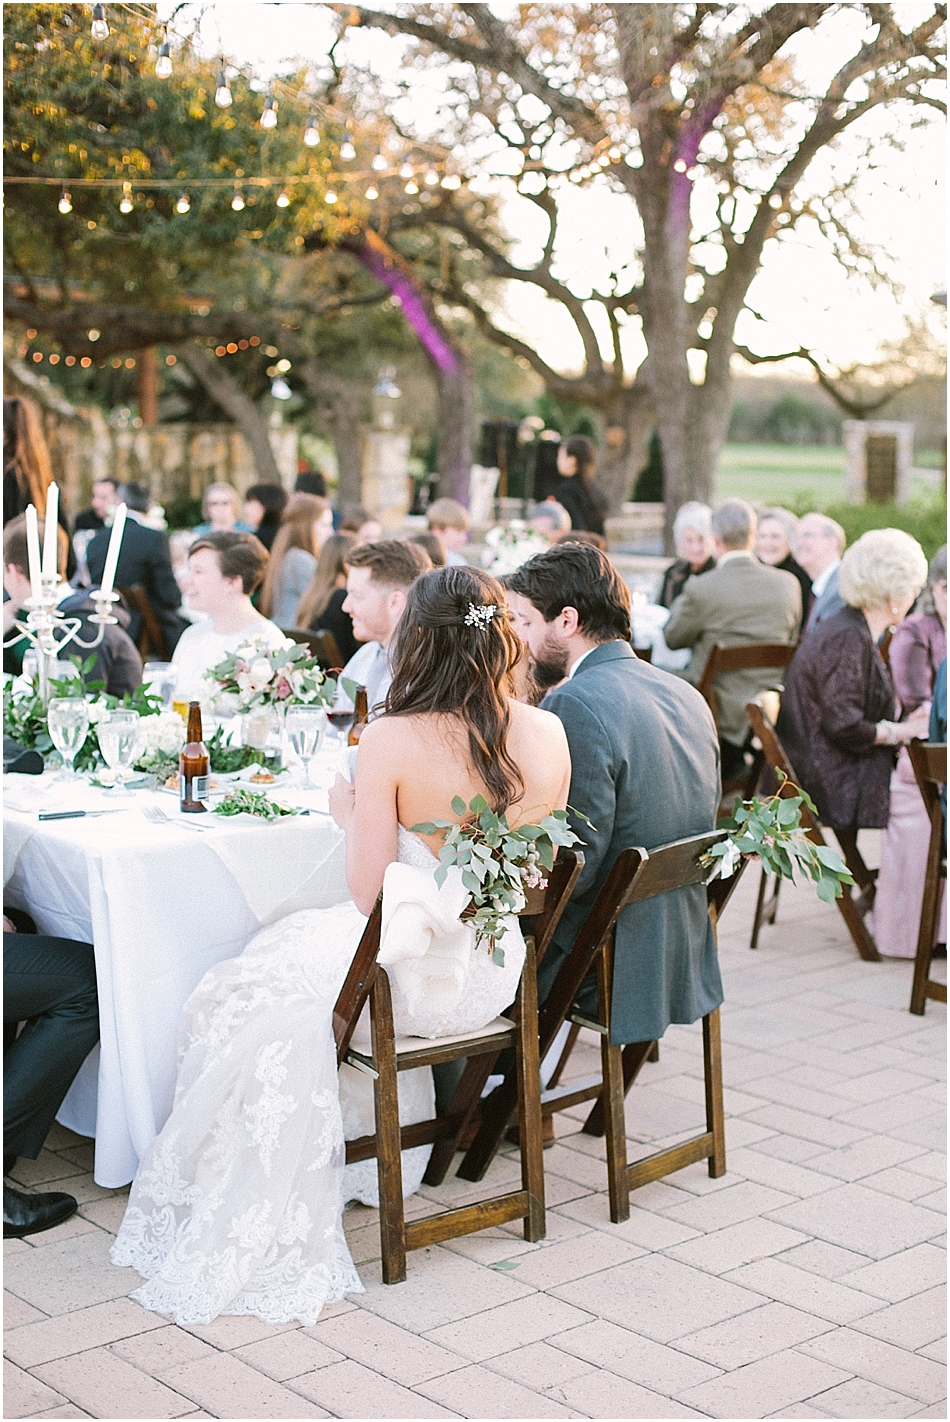 Central Texas Wedding | Fine Art | Vineyards at Chappel Lodge | Spring Wedding | Austin-17.jpg